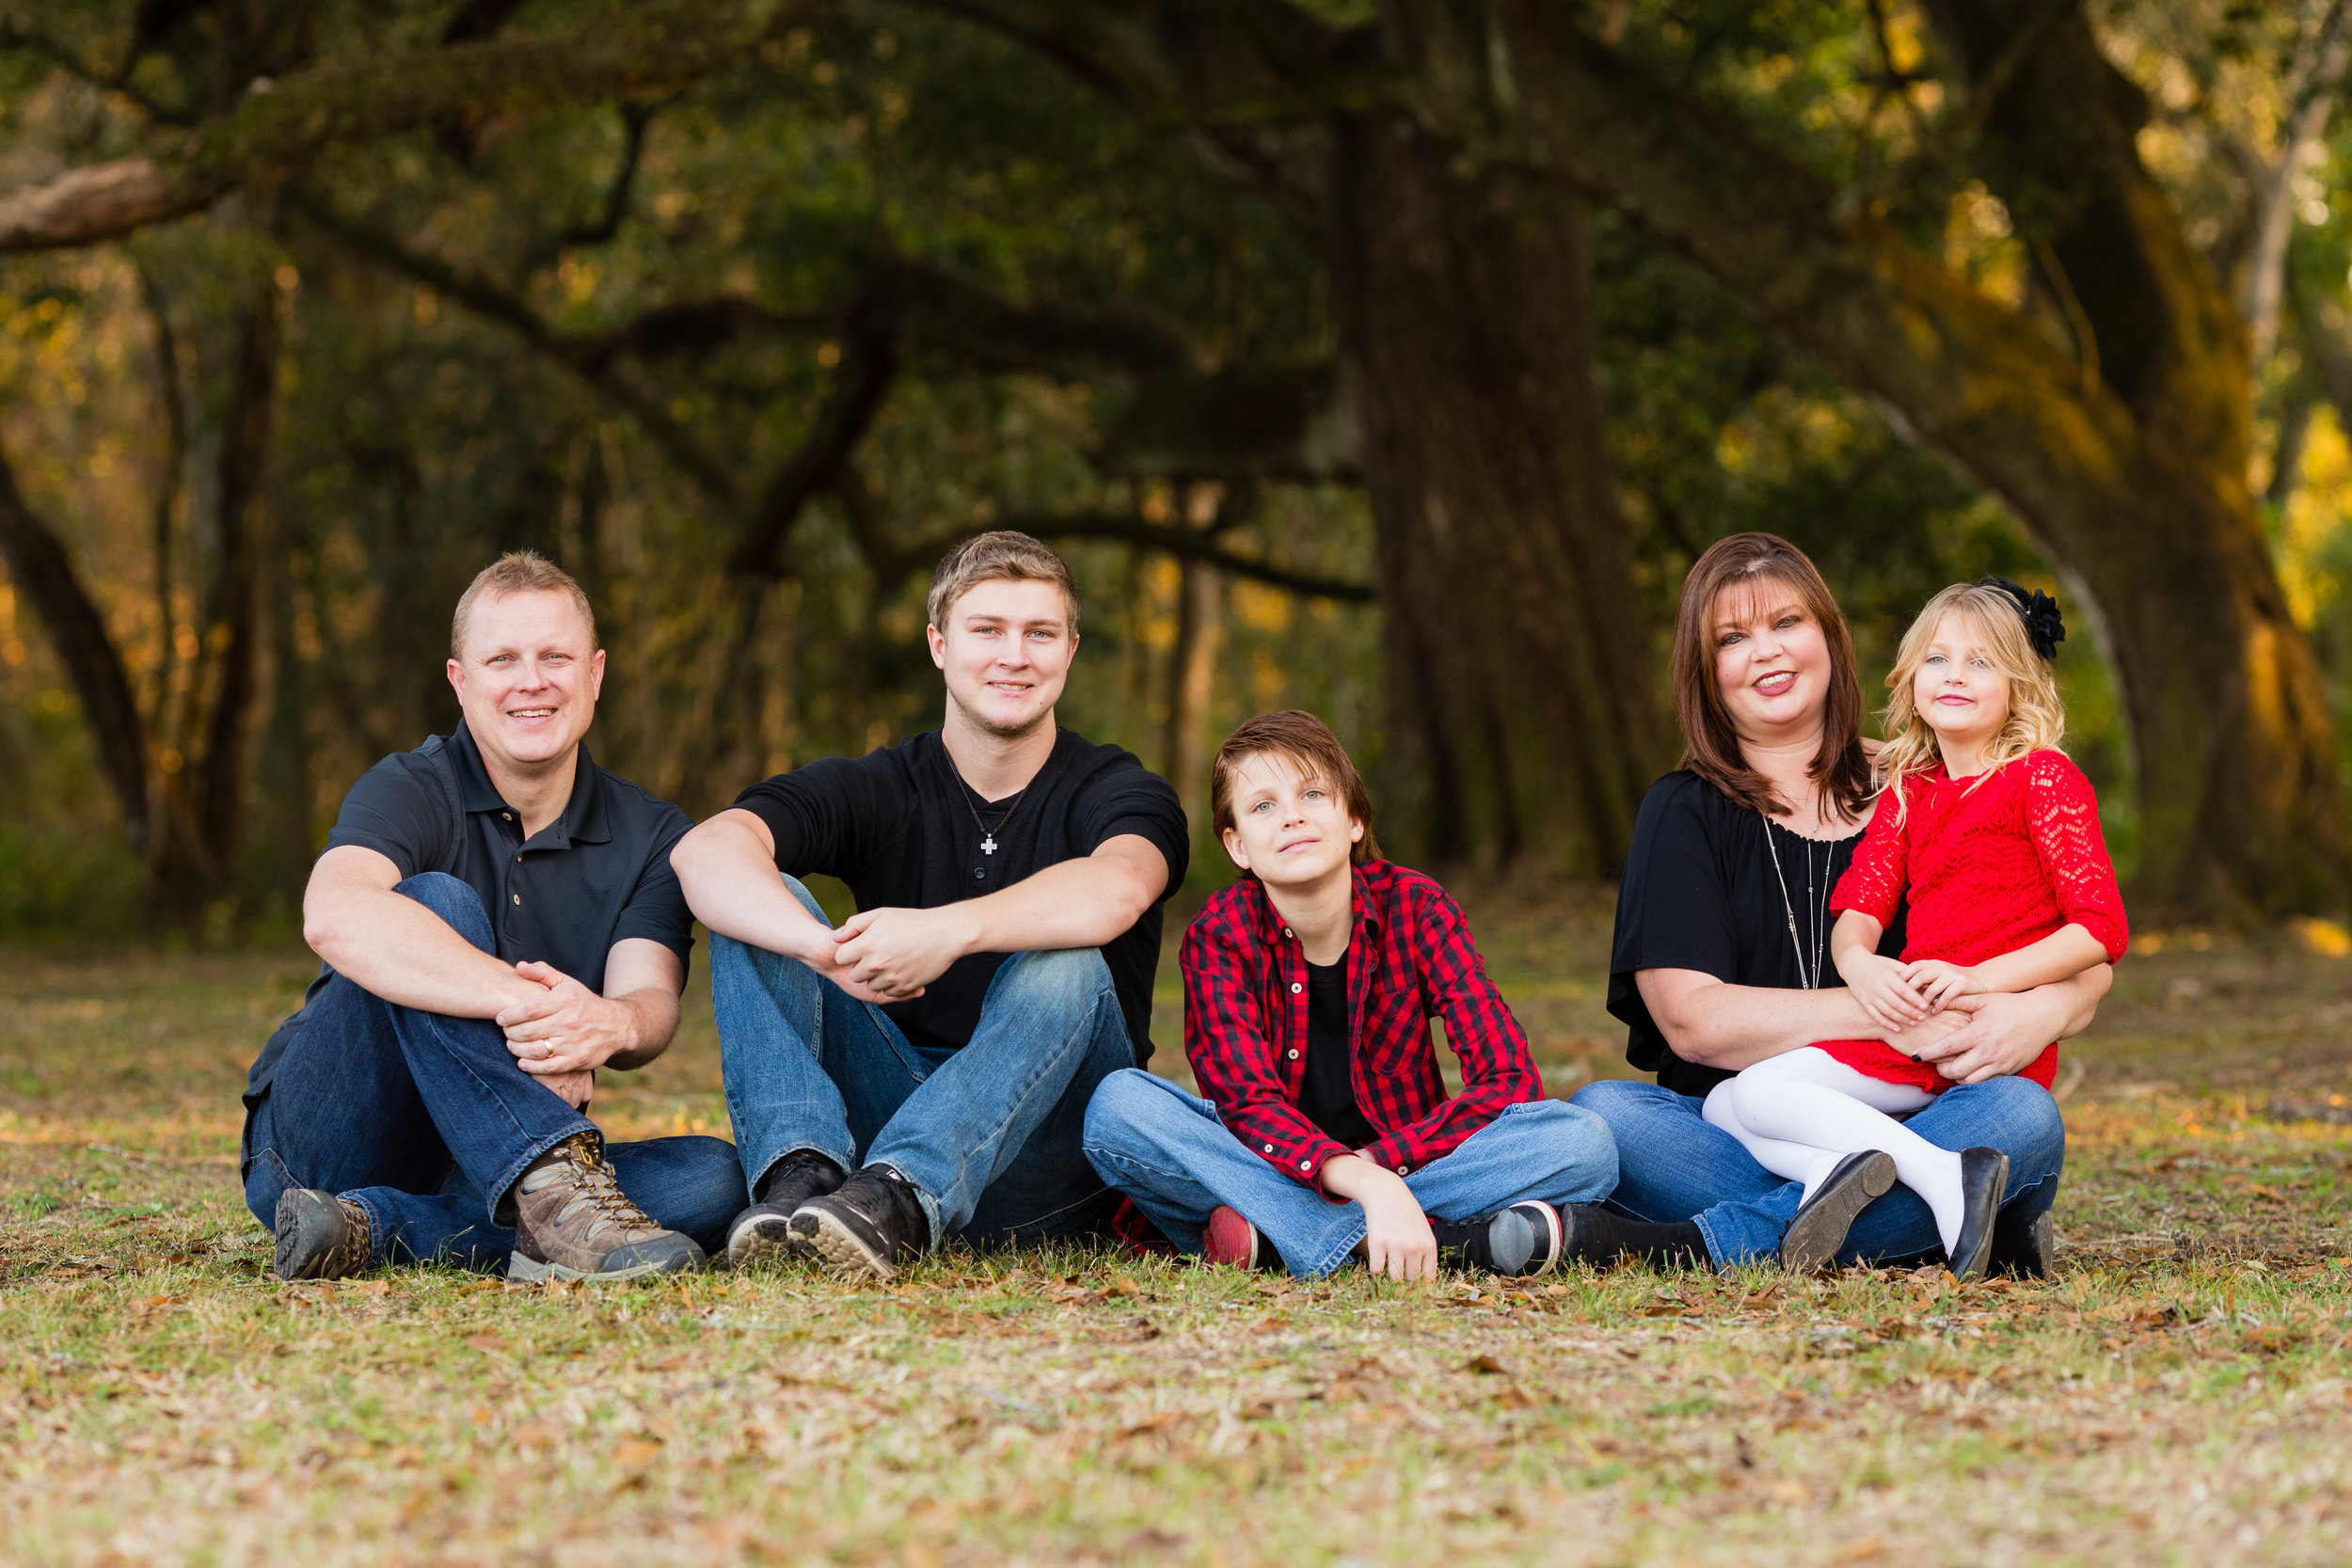 Family-child-portrait-lafayette-broussard-youngsville-photographer-15.jpg